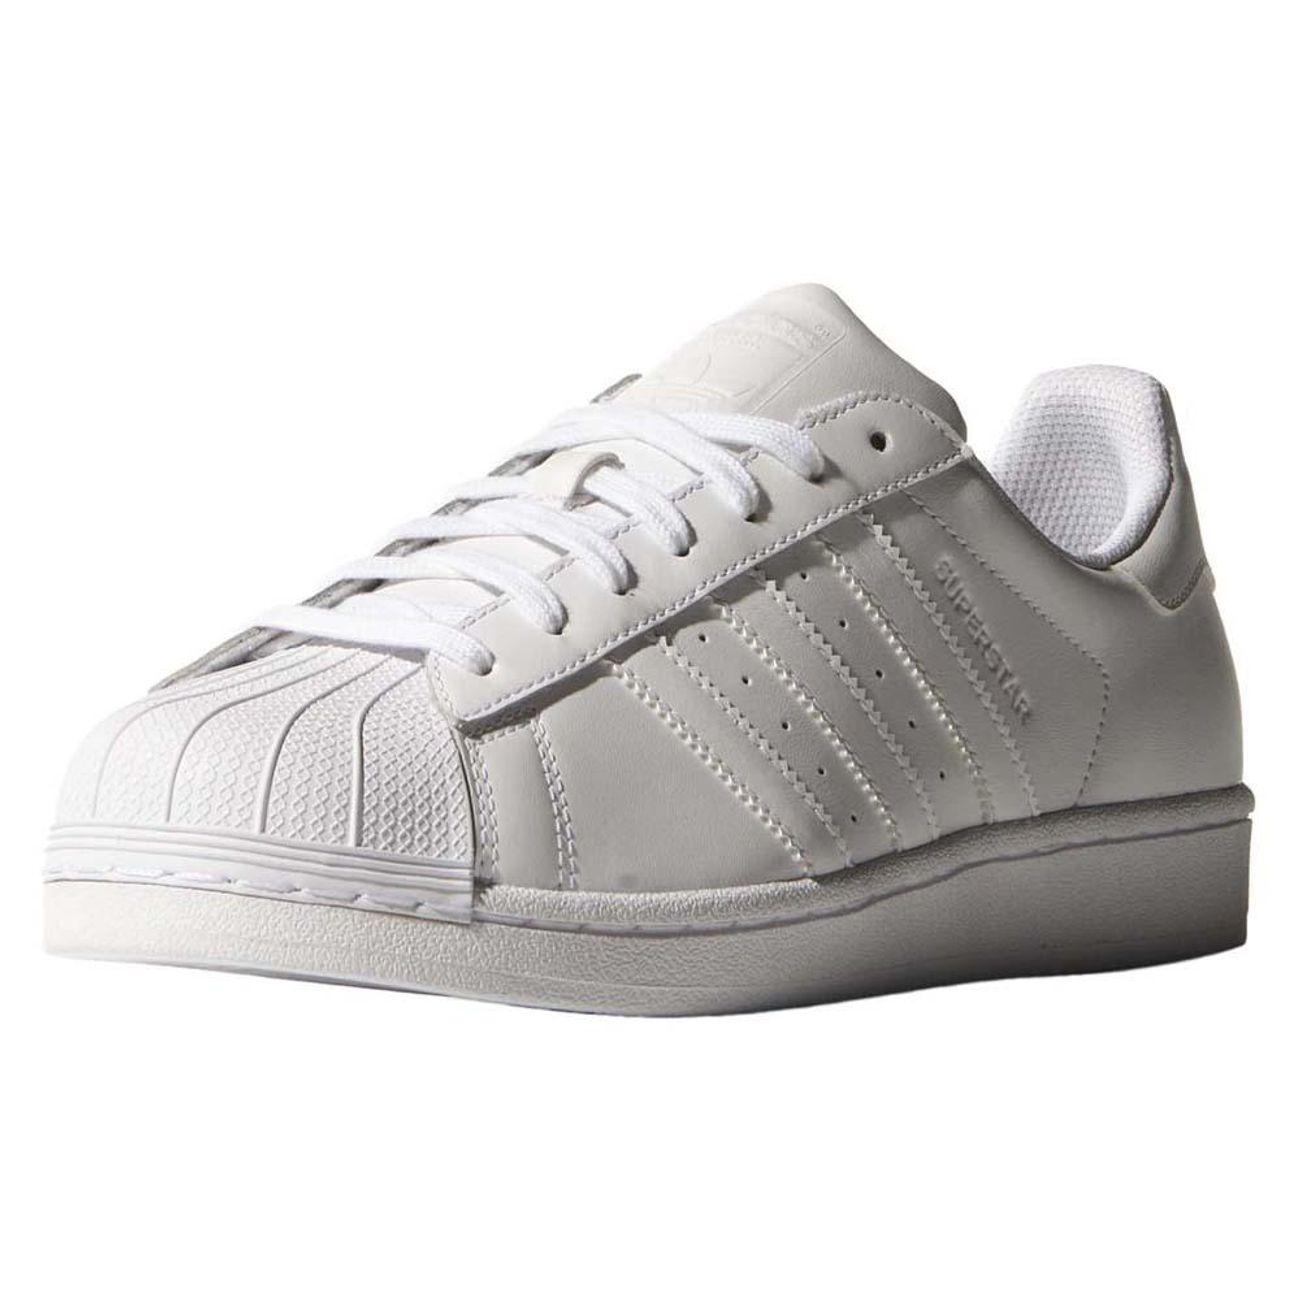 Mode- Lifestyle homme ADIDAS ORIGINALS Adidas Originals Superstar Foundation